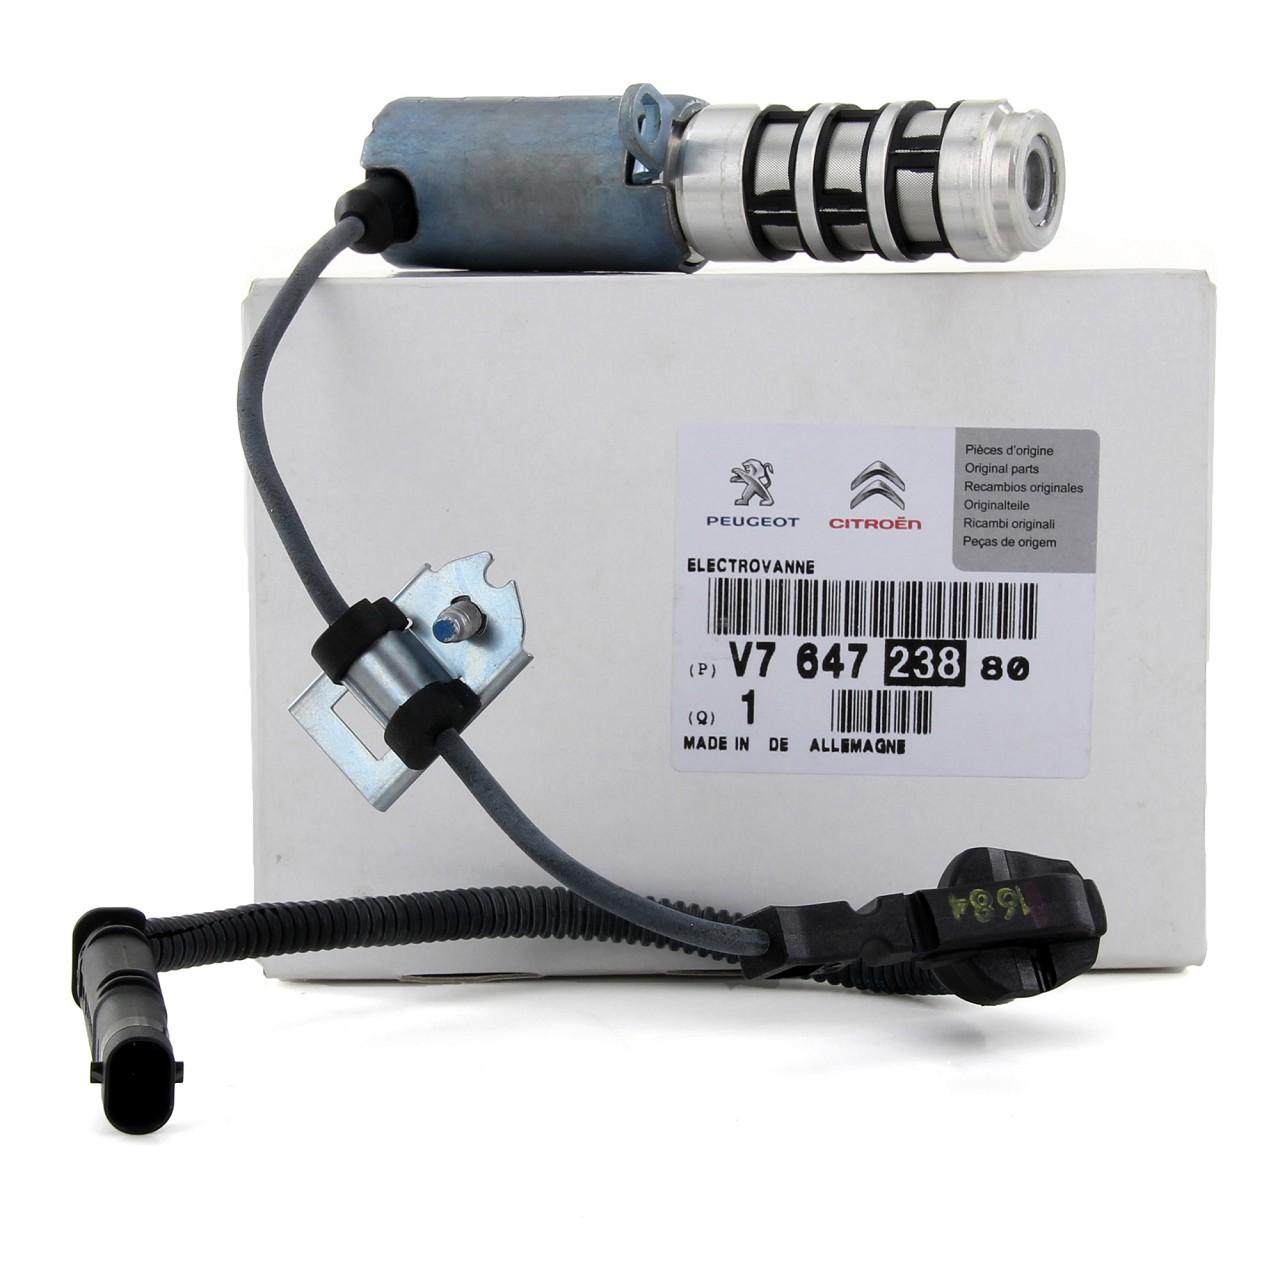 ORIGINAL Peugeot Öldruckventil 2008 207 208 3008 308 5008 508 RCZ V764723880